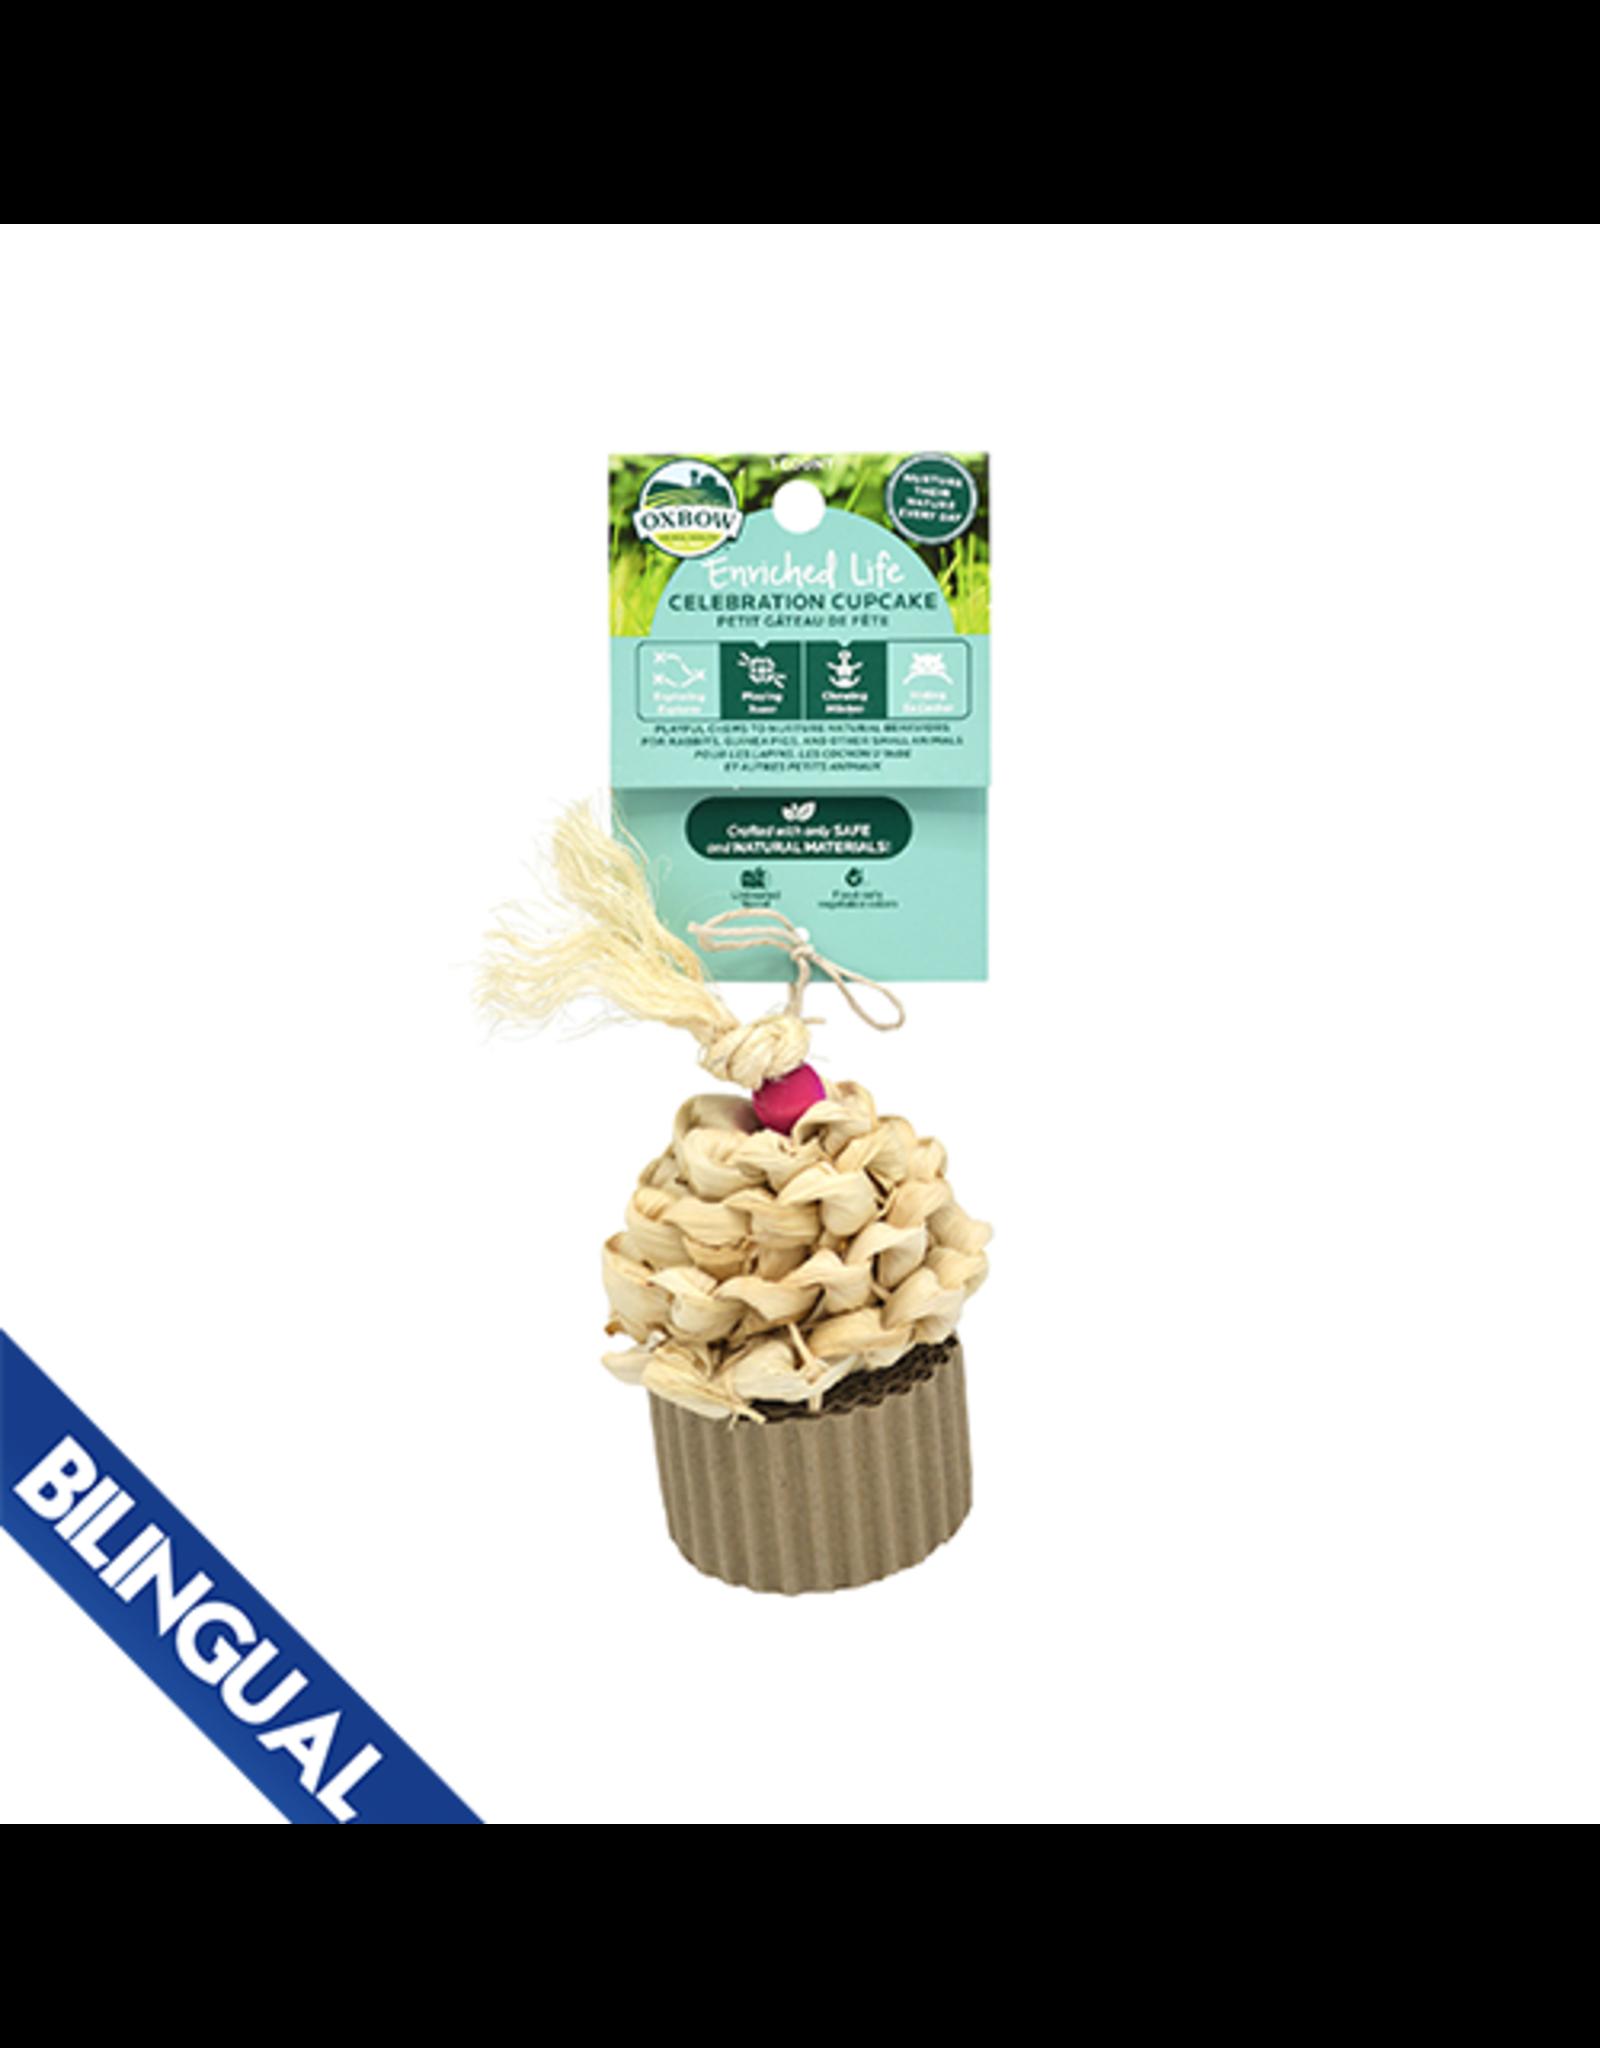 Oxbow Oxbow / Enriched Life / Celebration Cupcake